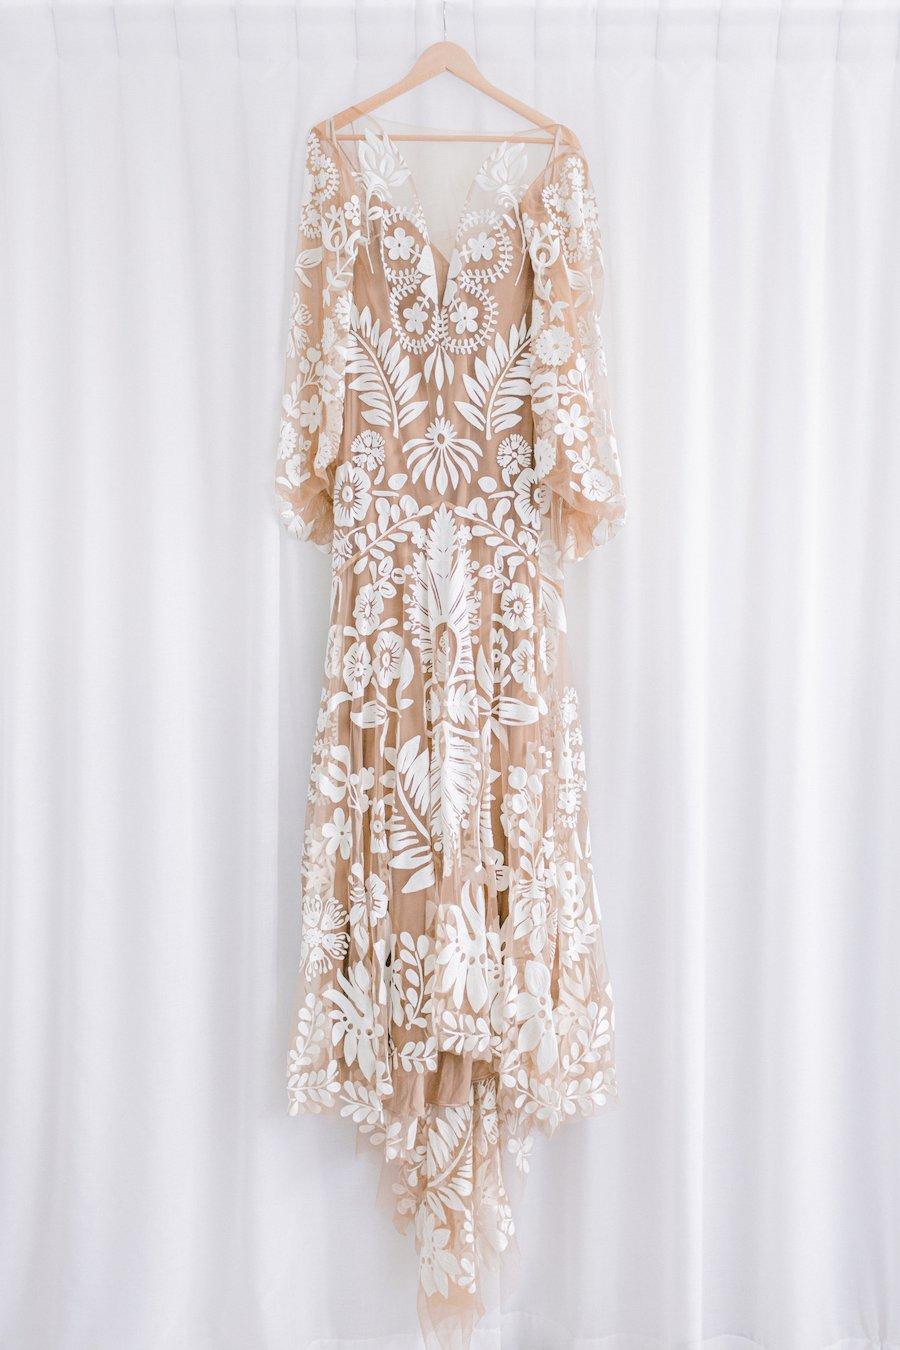 rue de sain wedding dress